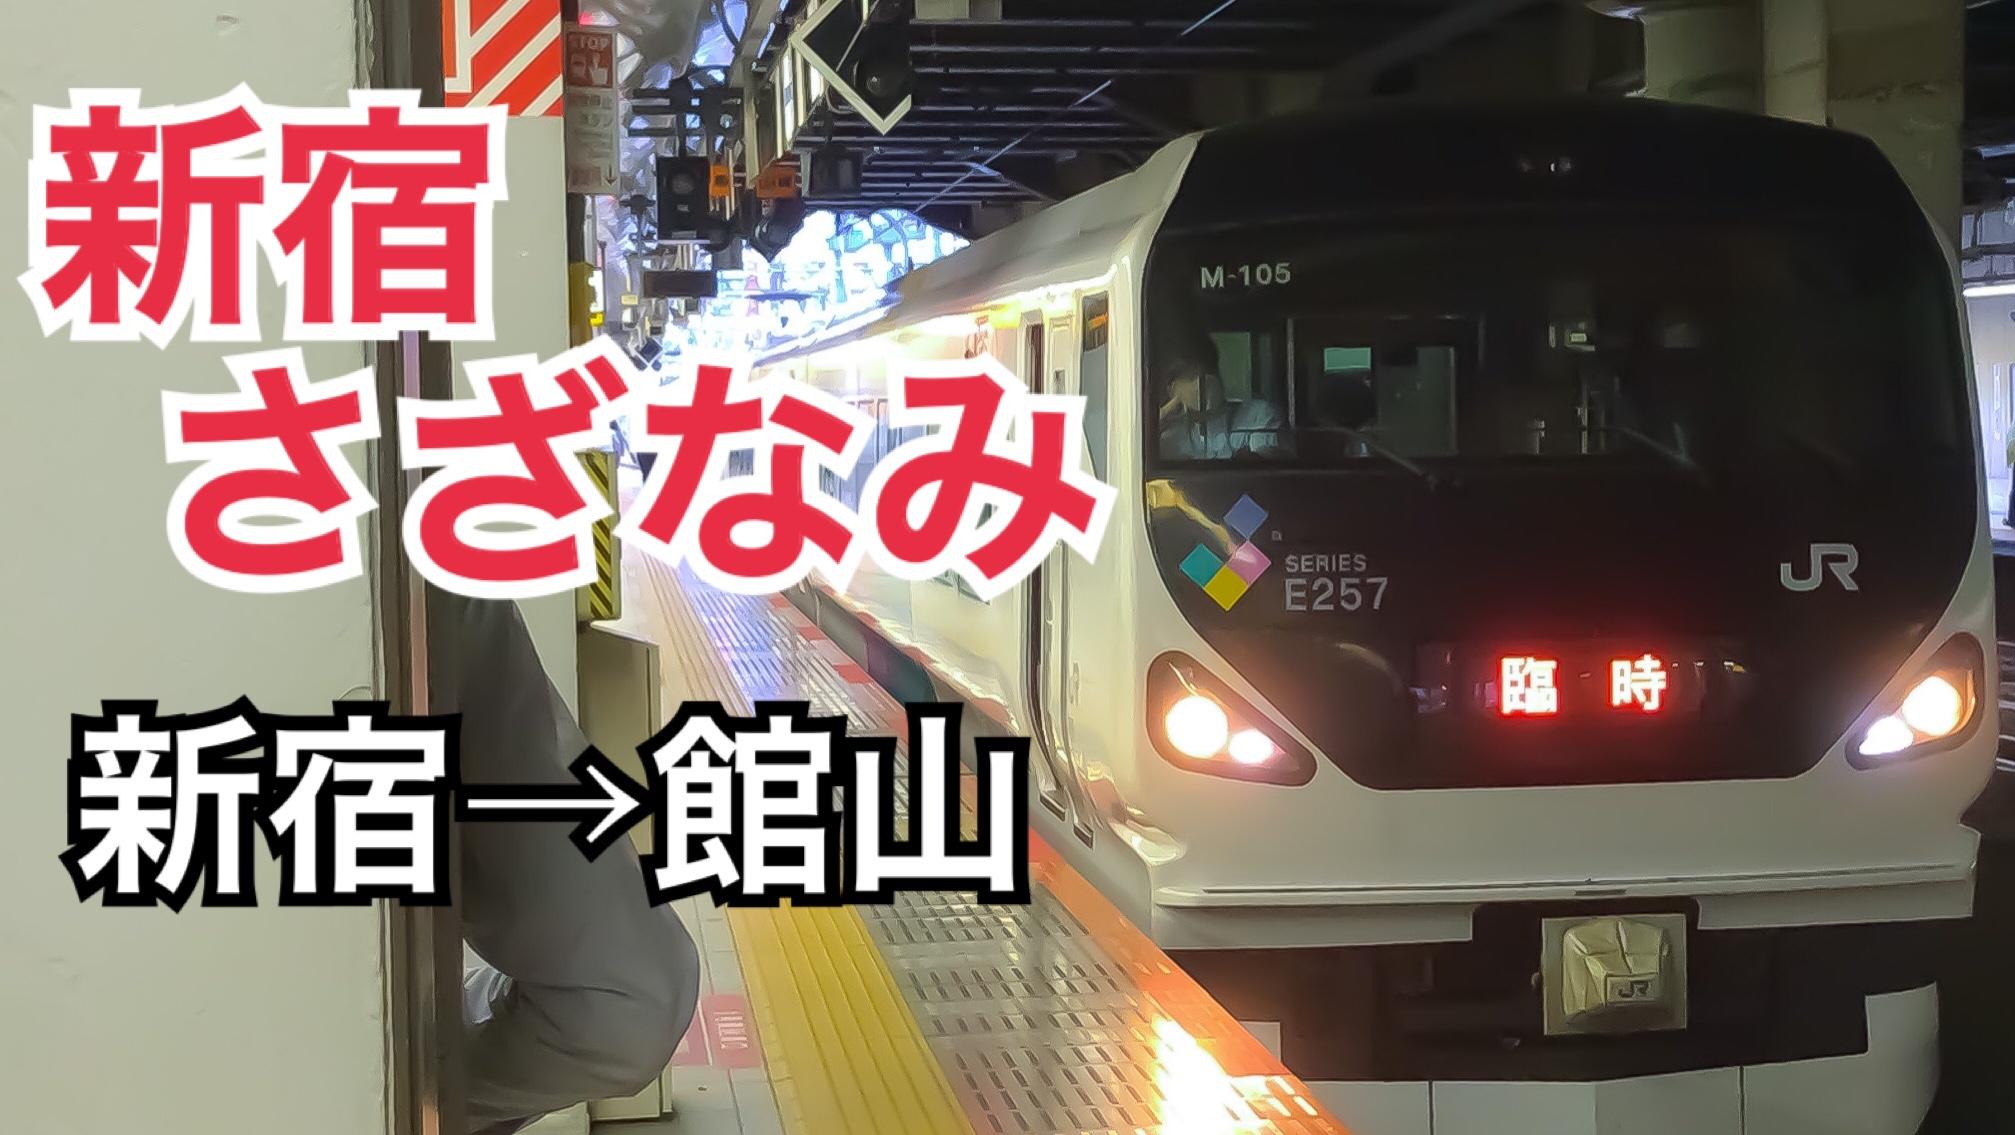 E257系9両で運転!新宿さざなみ号に乗車!指定席はガラガラ!?【新宿房総1周大回り】